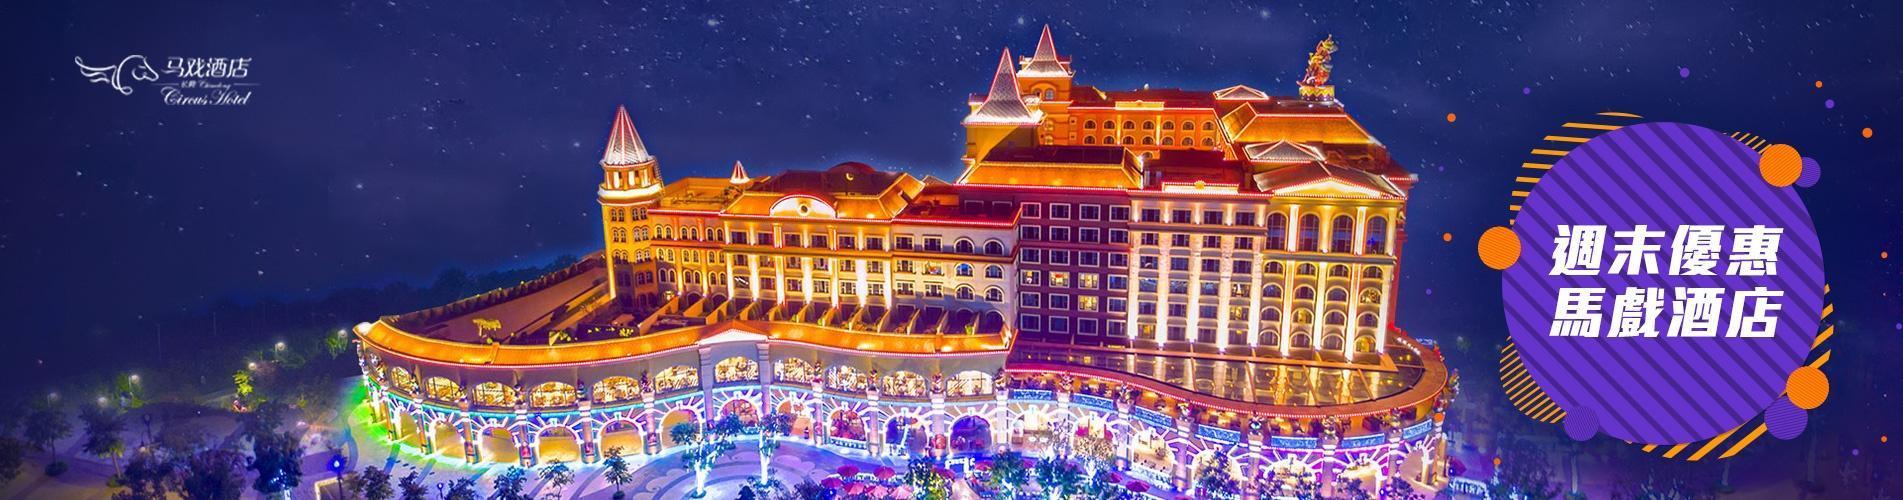 珠海長隆馬戲酒店 Chimelong Circus Hotel